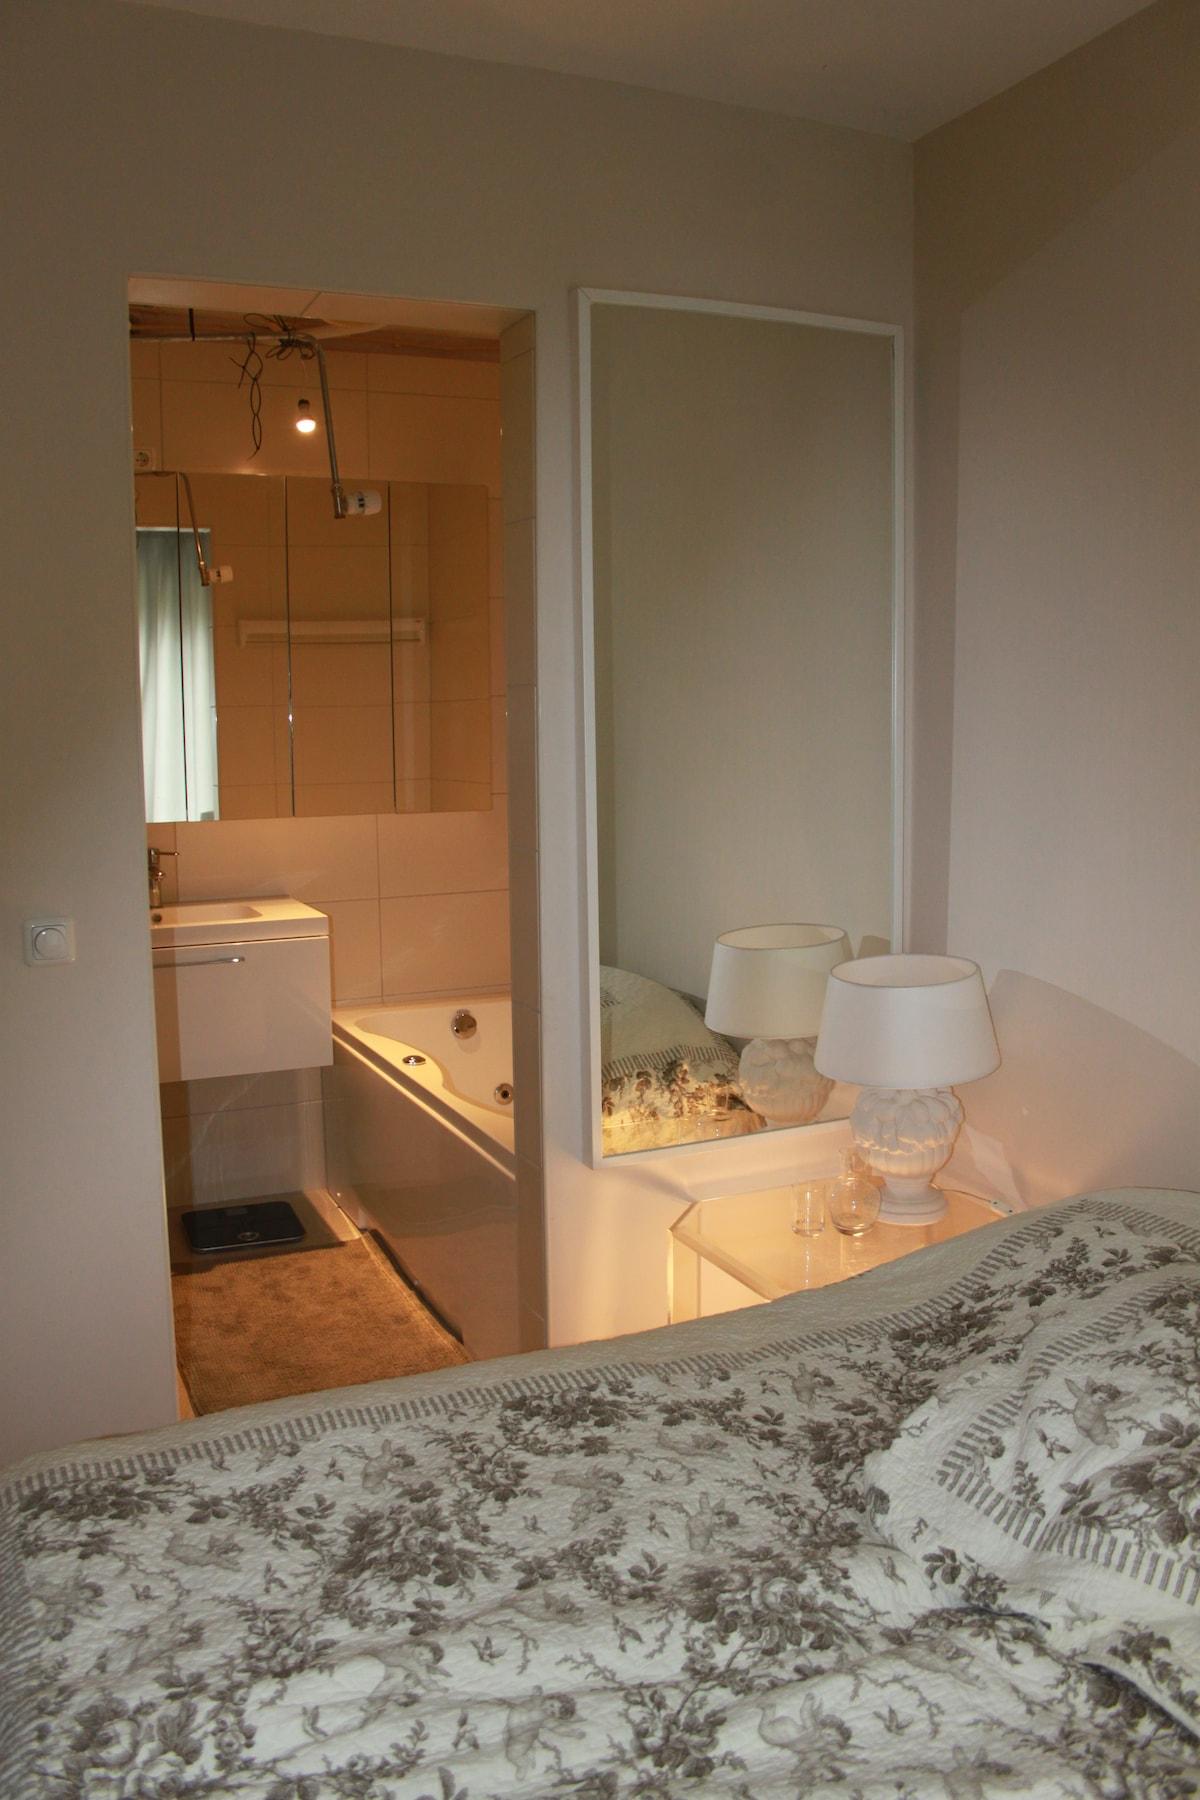 Private room in The Hague/Rijswijk